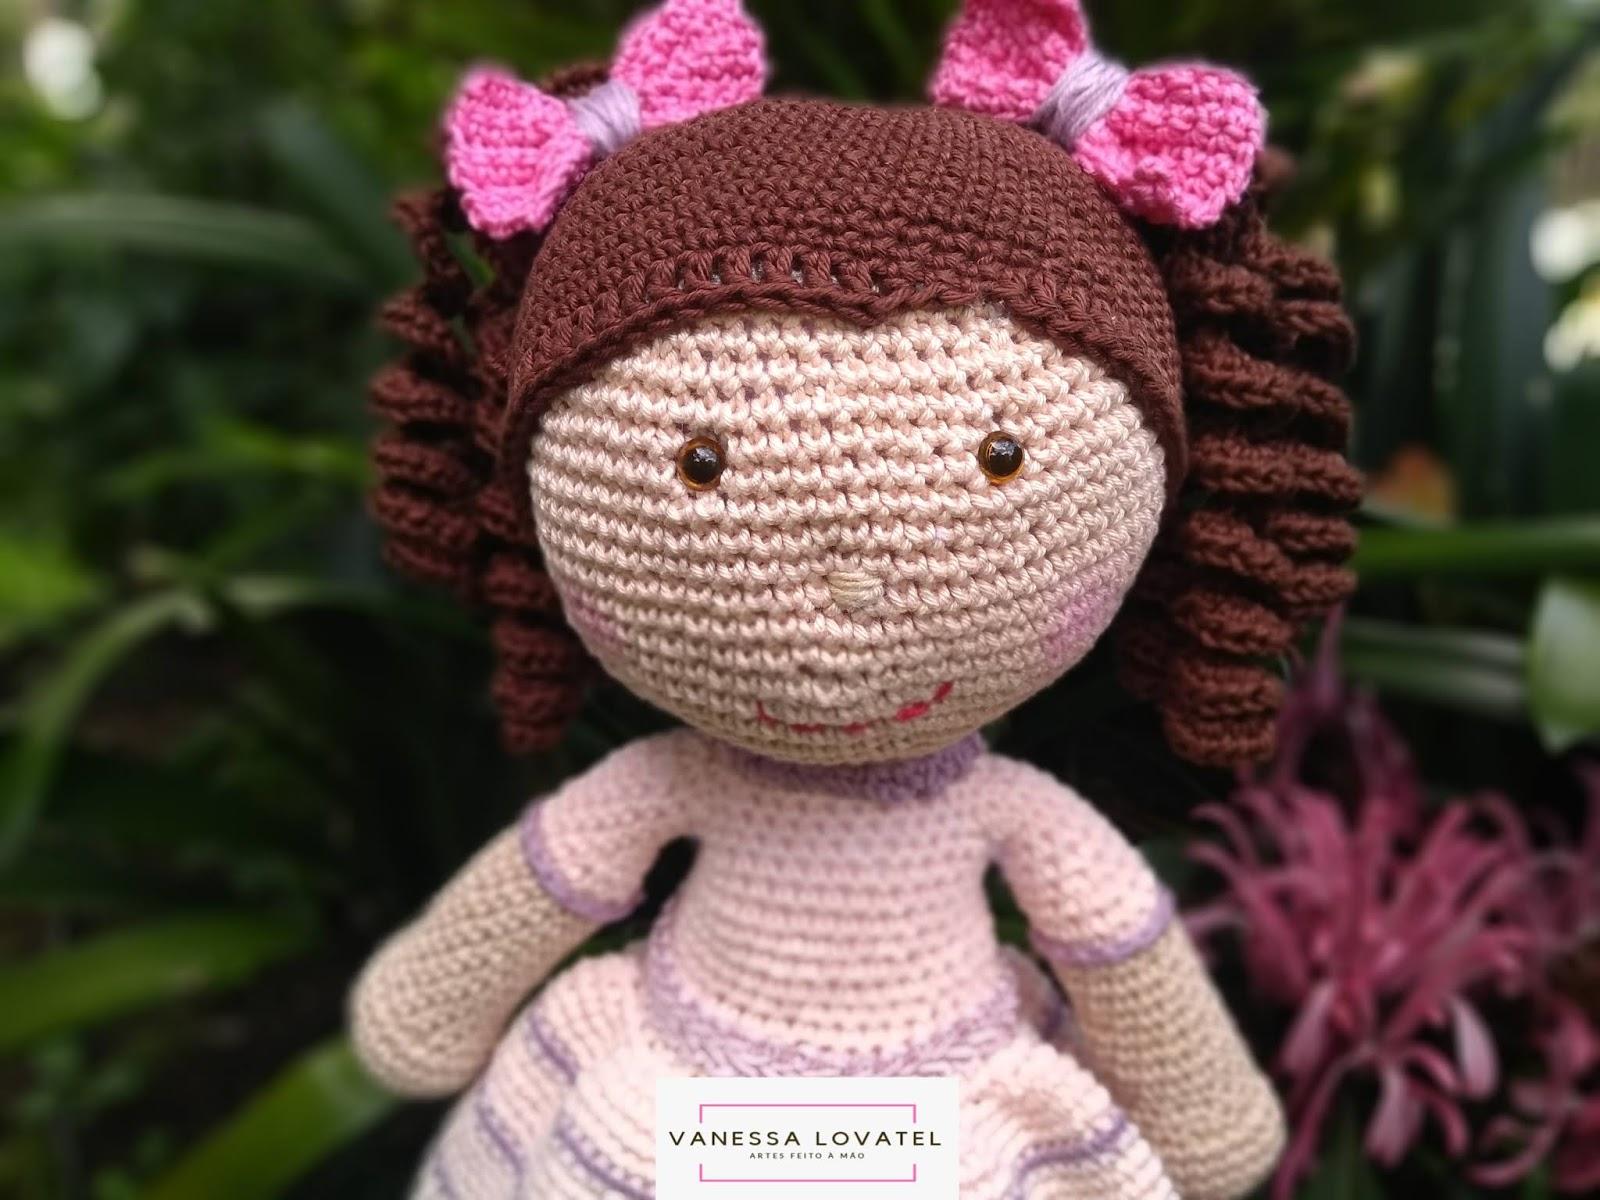 Boneca de crochê: +40 ideias com amigurumi fantásticas ...   1200x1600